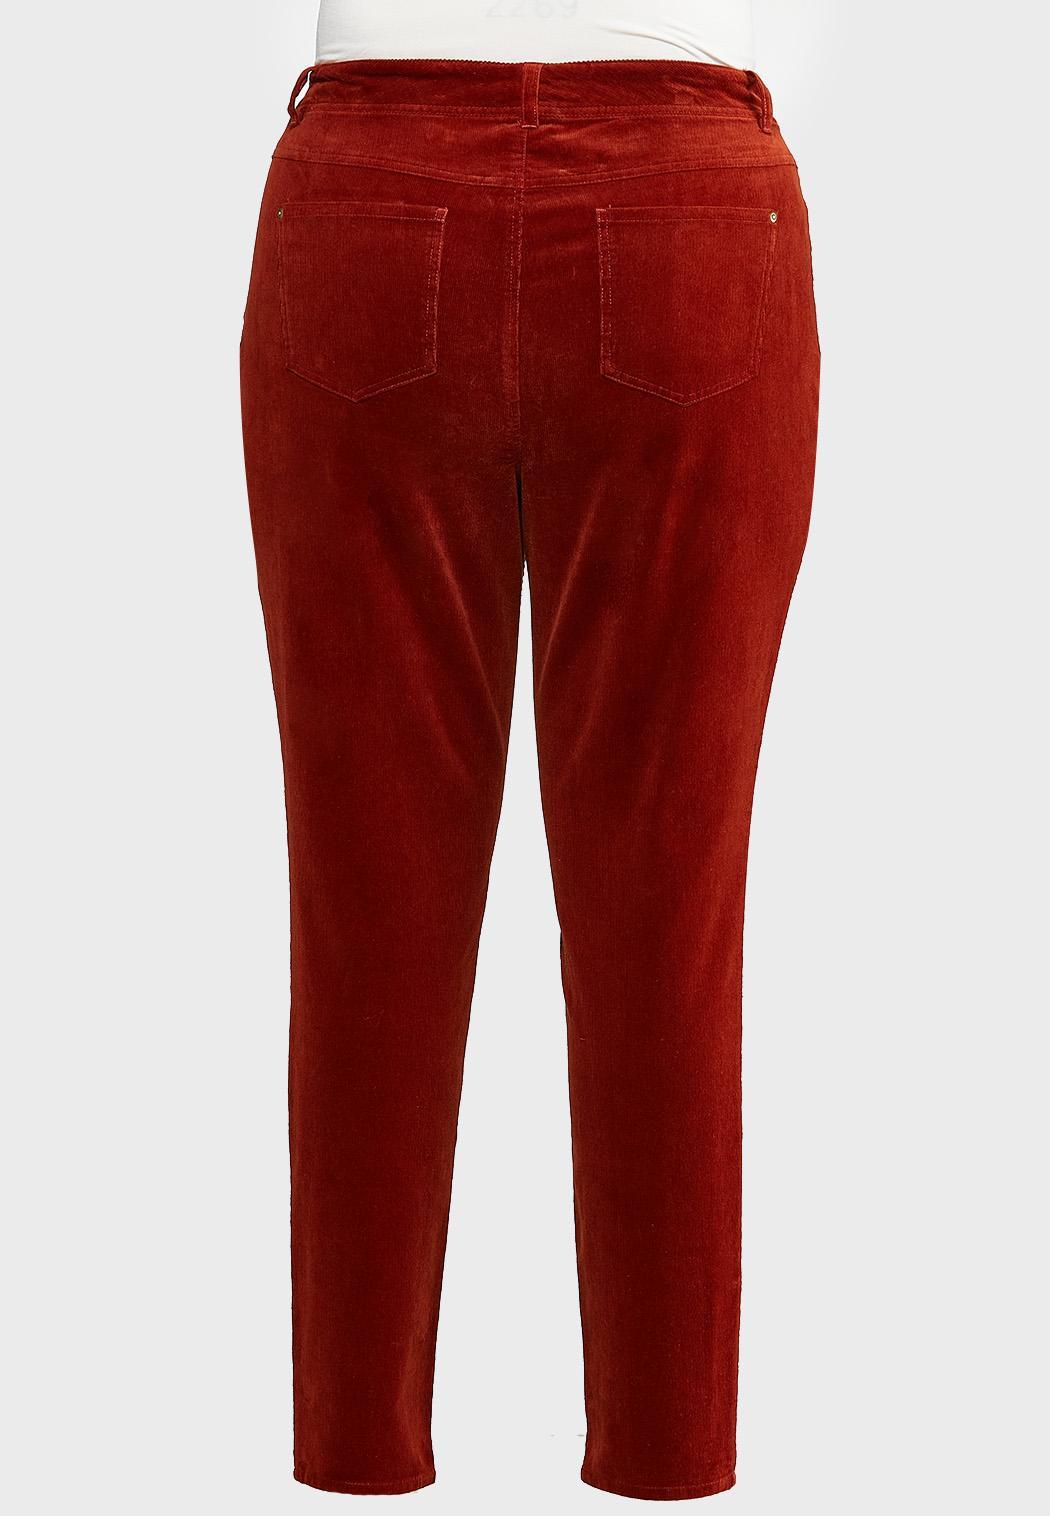 Plus Size Corduroy Slim Pants (Item #43992601)